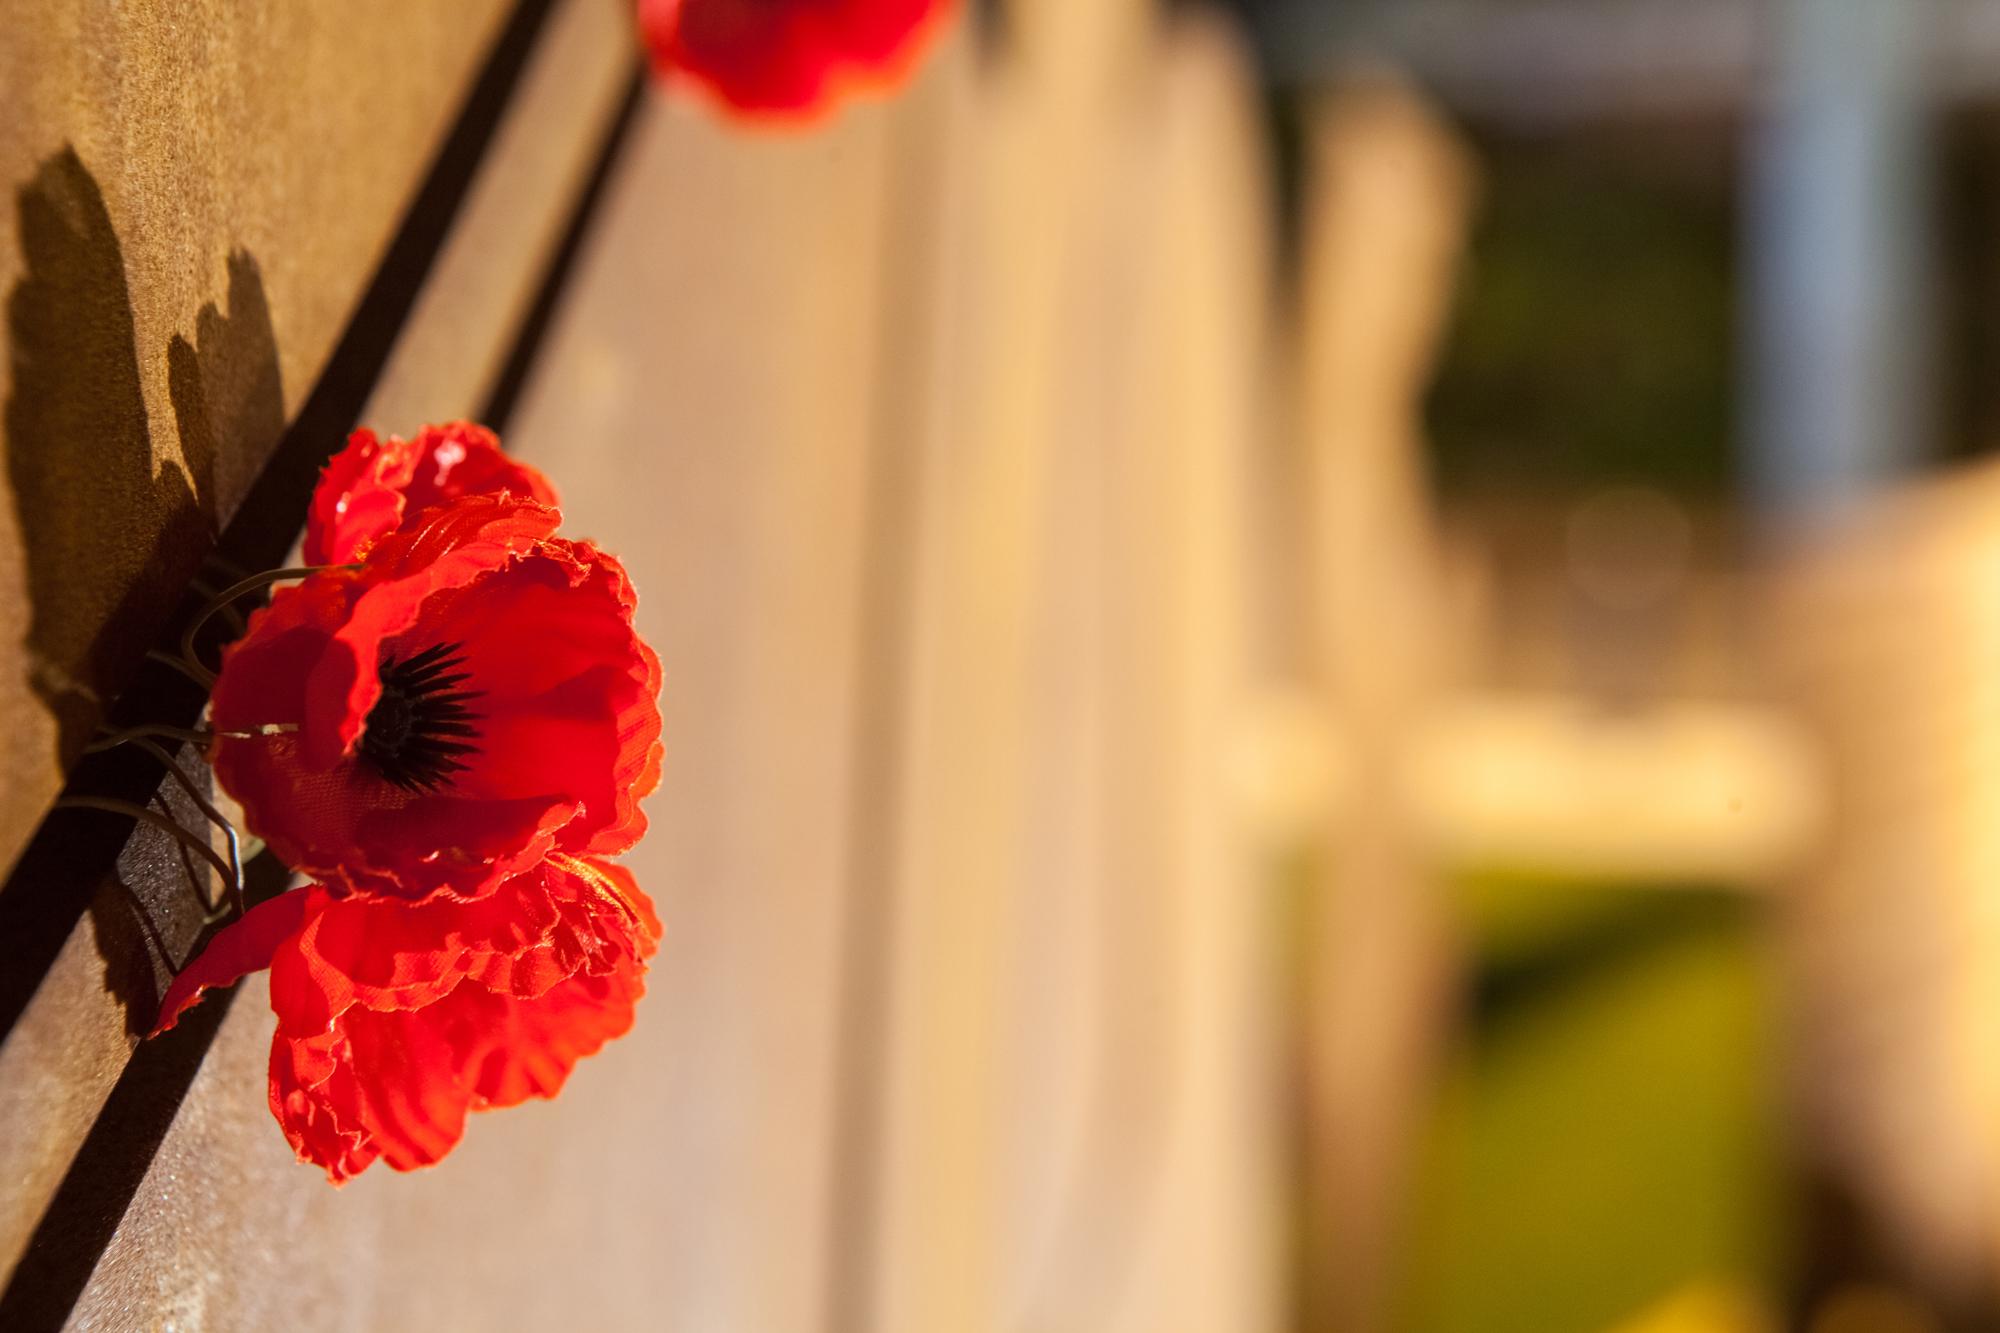 Drawn poppy australian Most Harvey sublime Western Australia